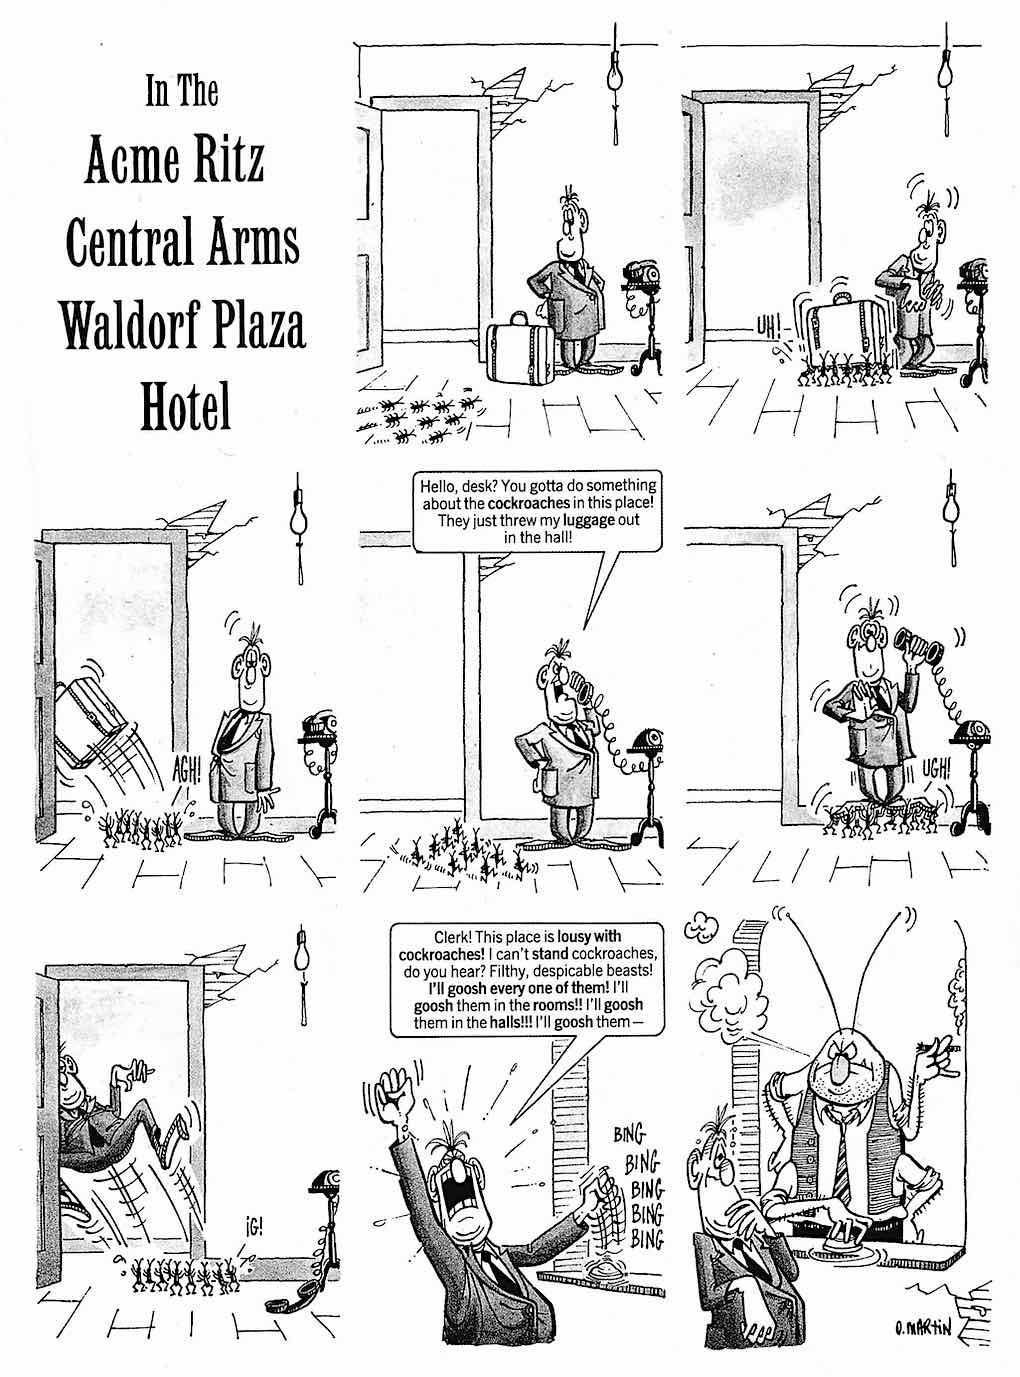 a Don Martin cartoon for MAD